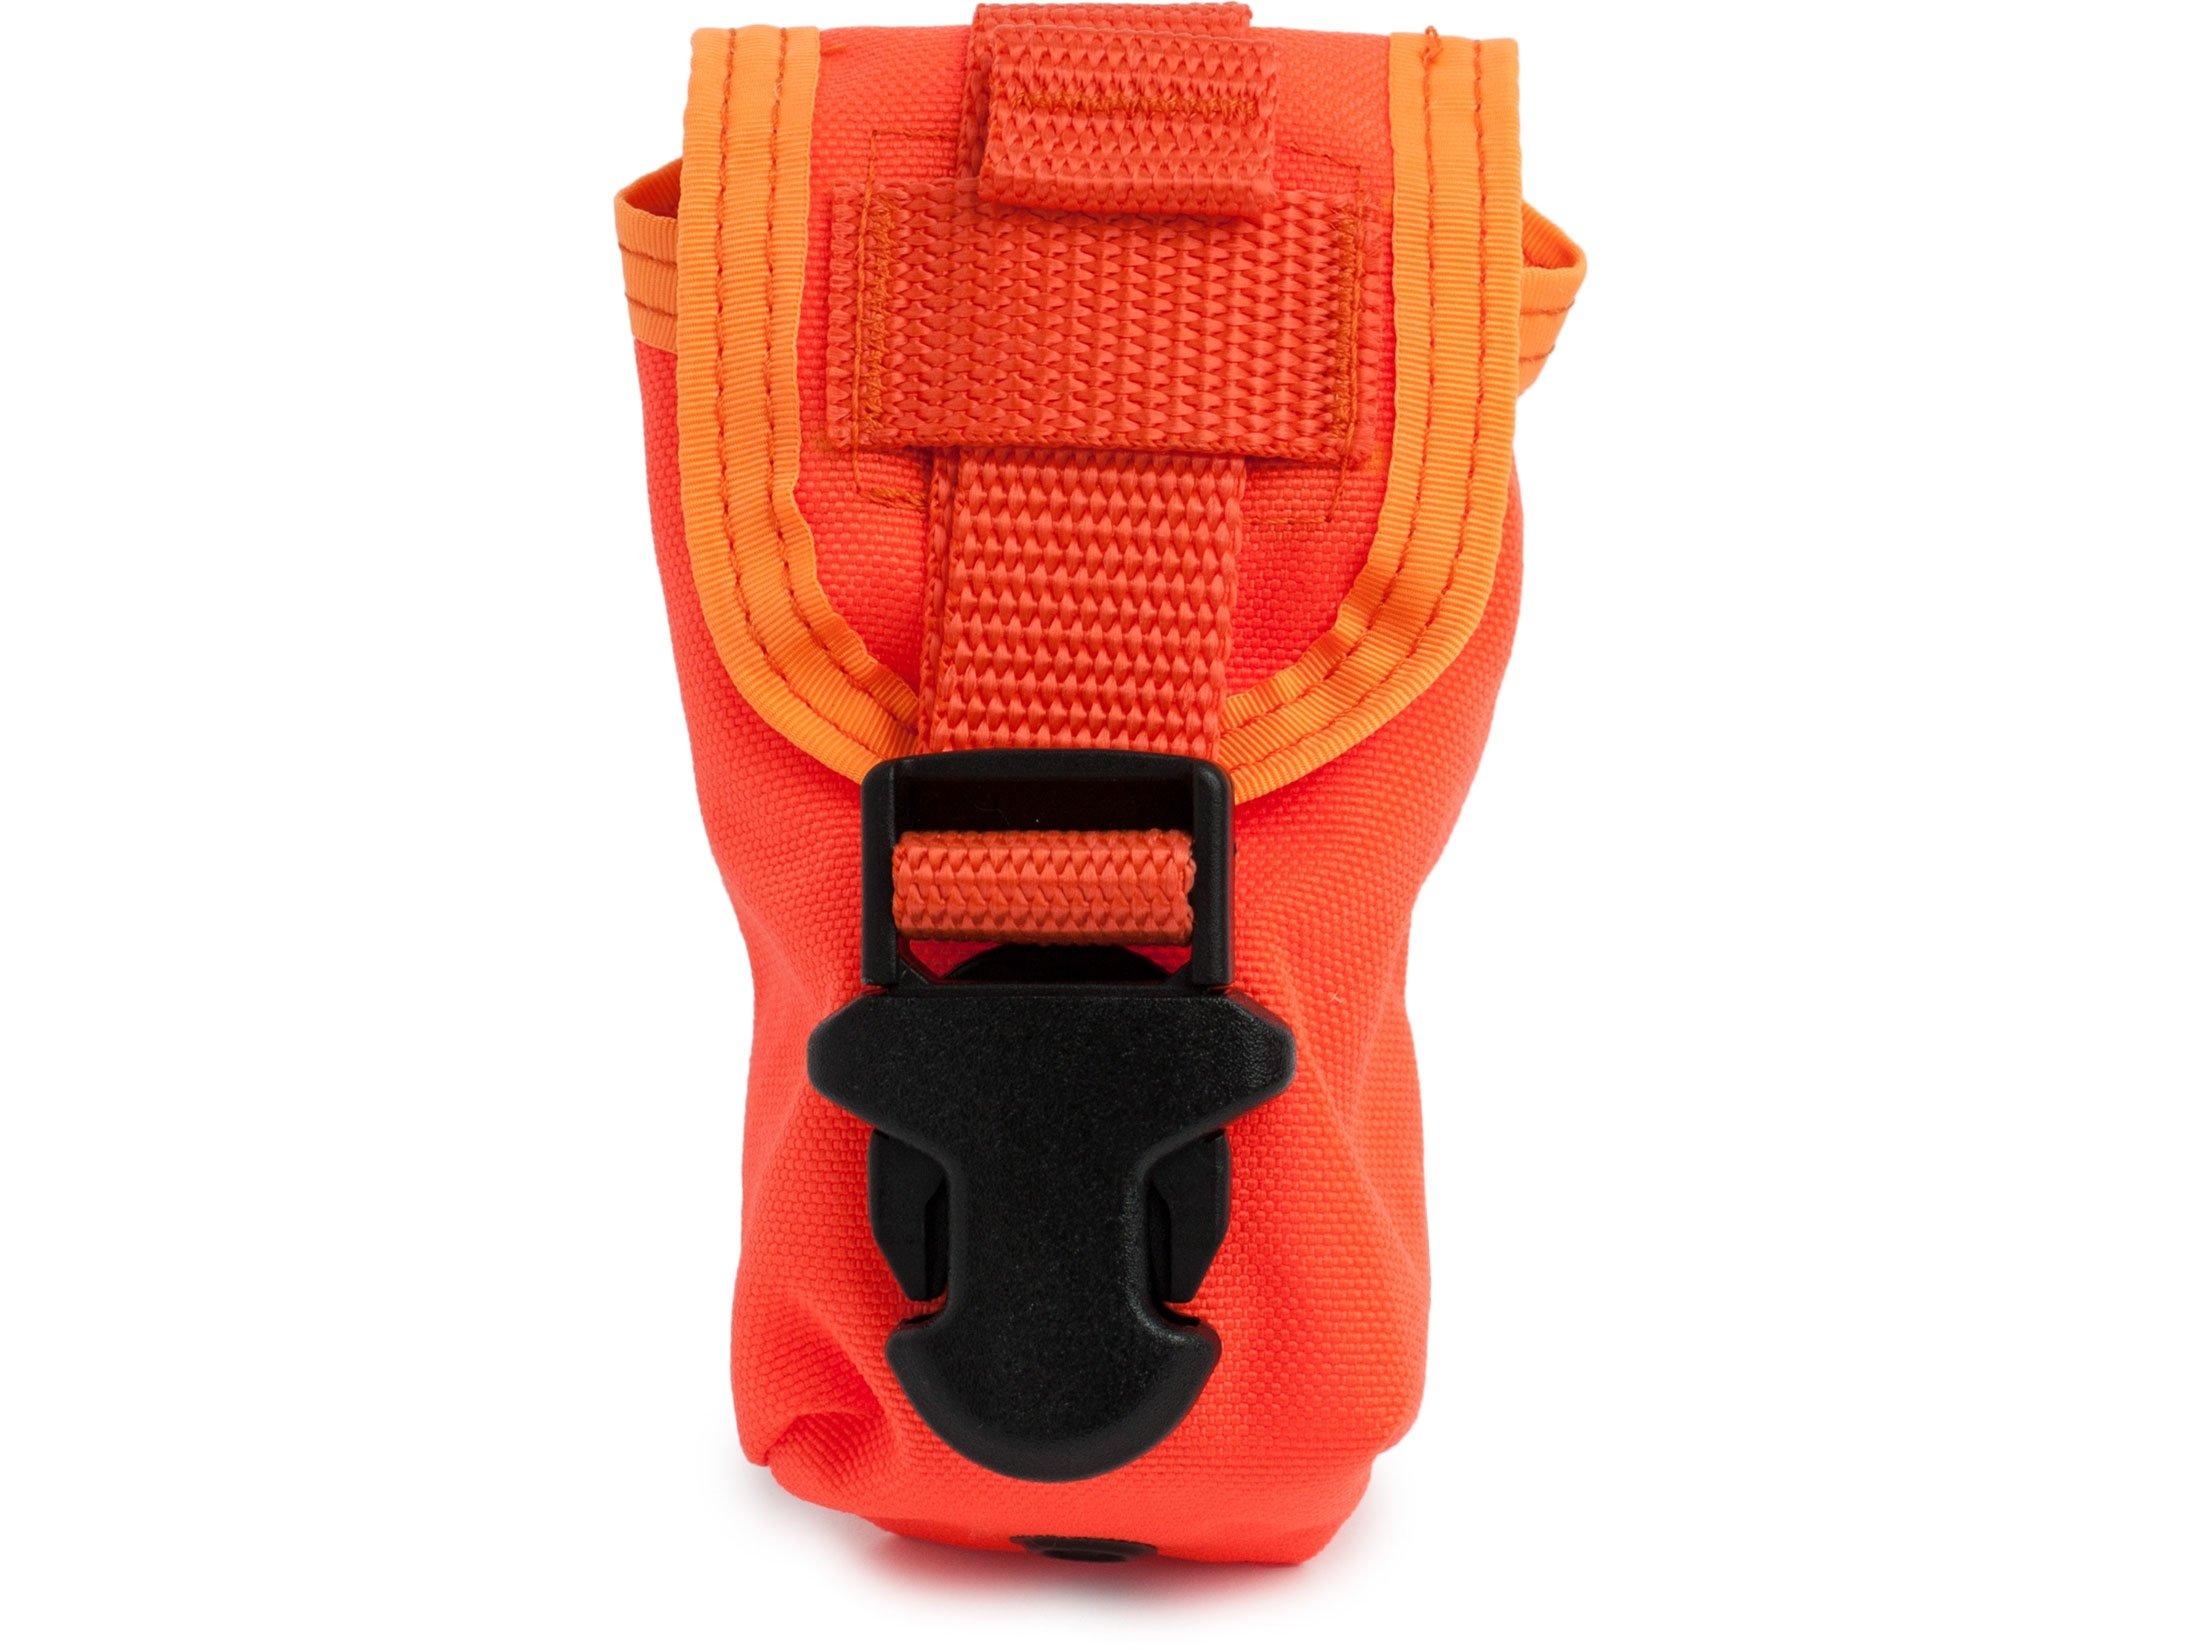 TMS Outdoors SOF-TT Wide Tourniquet Orange by TMS (Image #2)